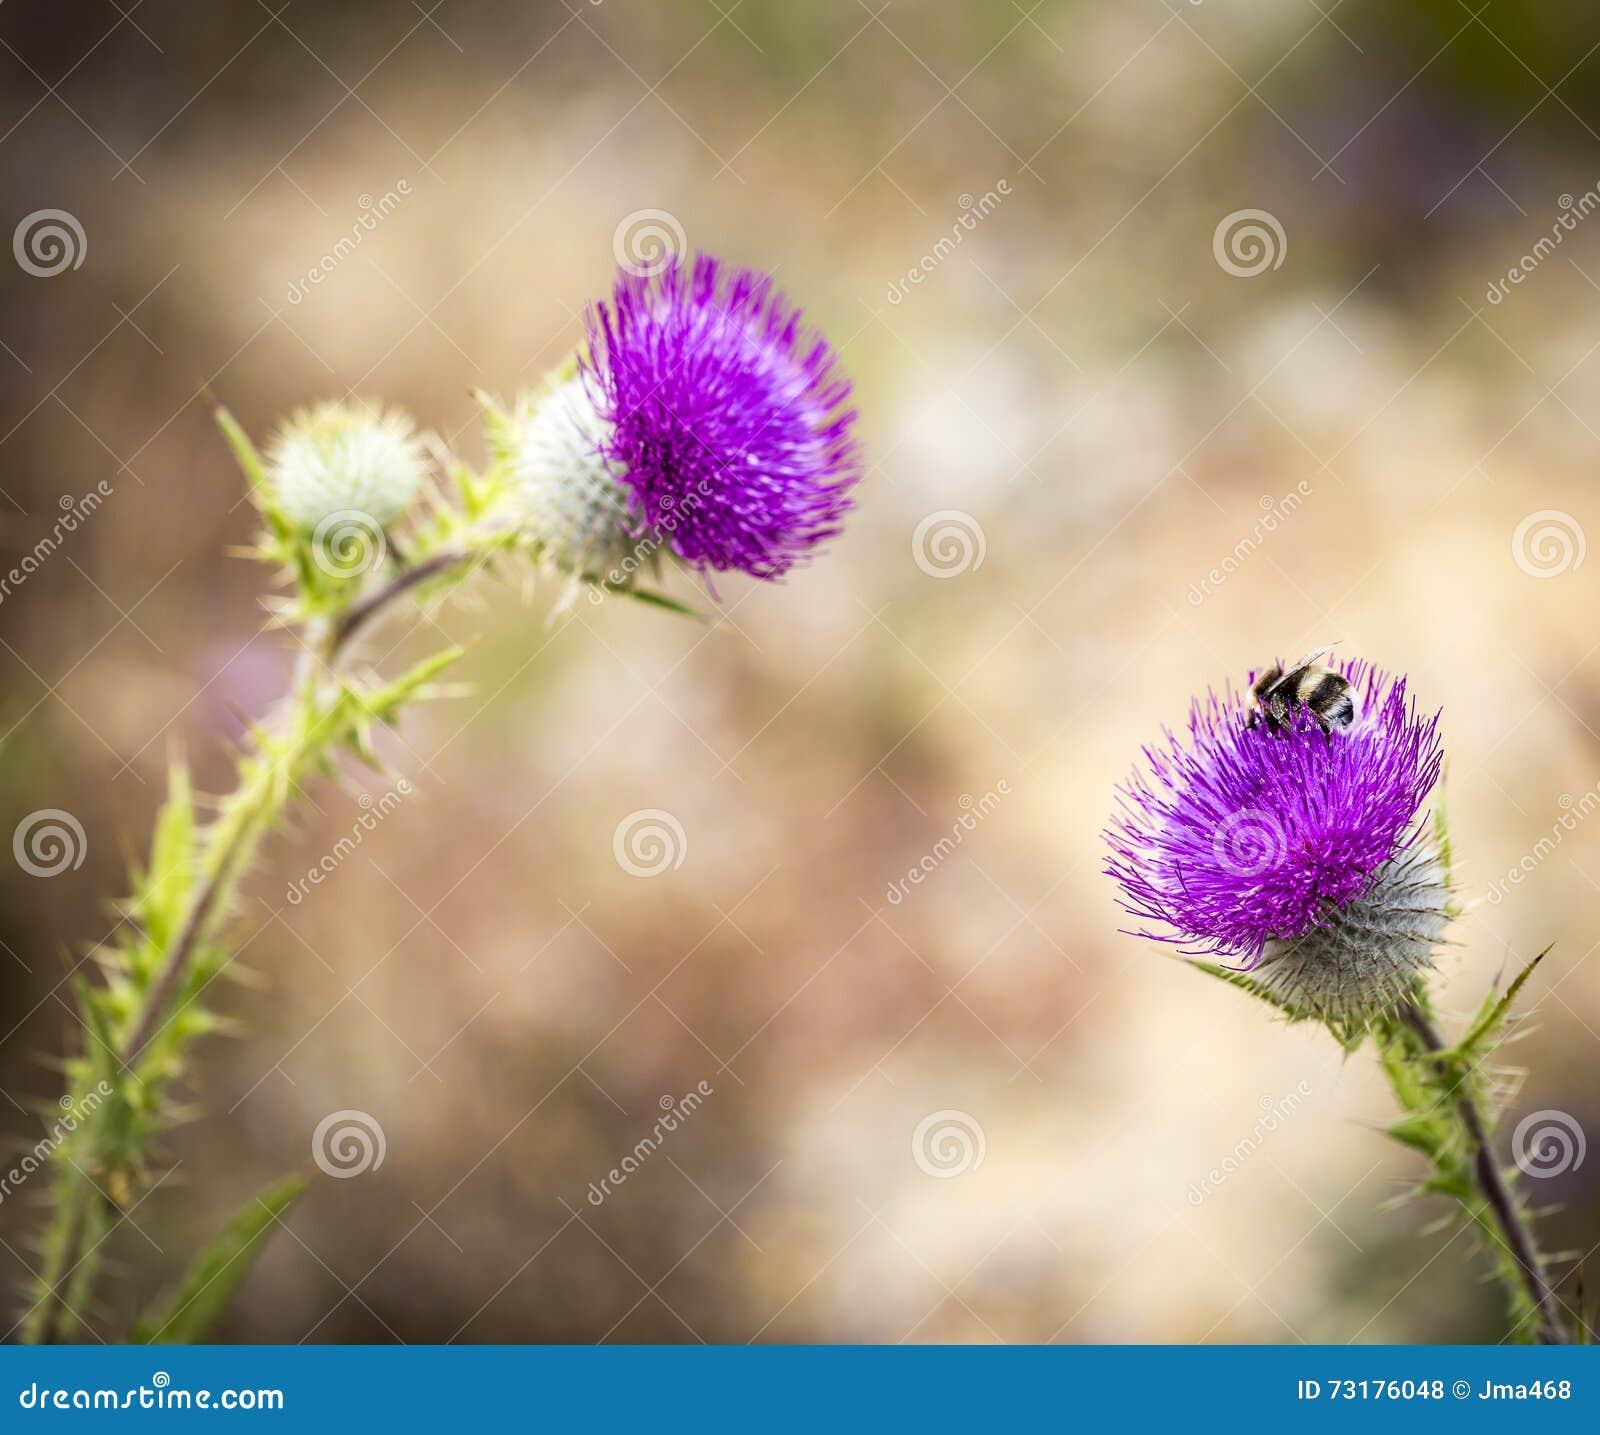 Bee on a Cirsium eriophorum - Woolly purple thistle